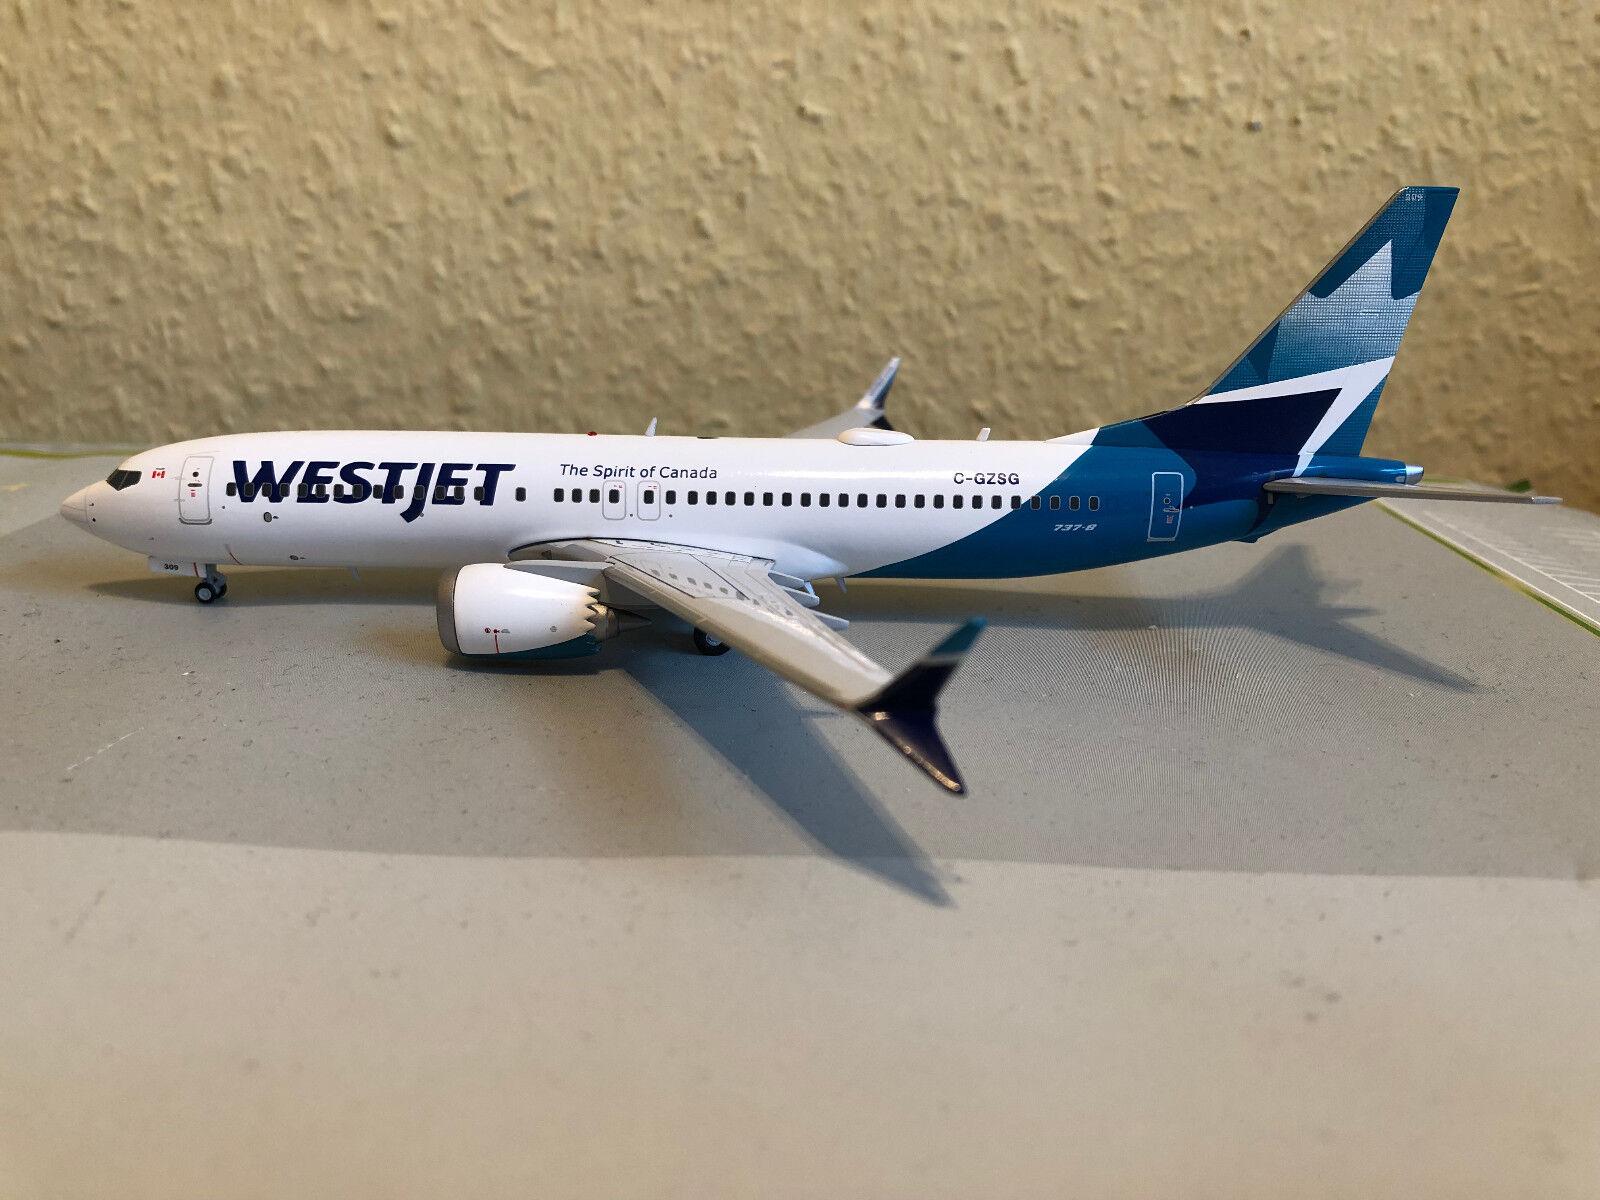 marca GeminiJets g2wja783 WestJet boeing b737 max-8 max-8 max-8 (New Livery) - C-gzsg, 1 200  la calidad primero los consumidores primero